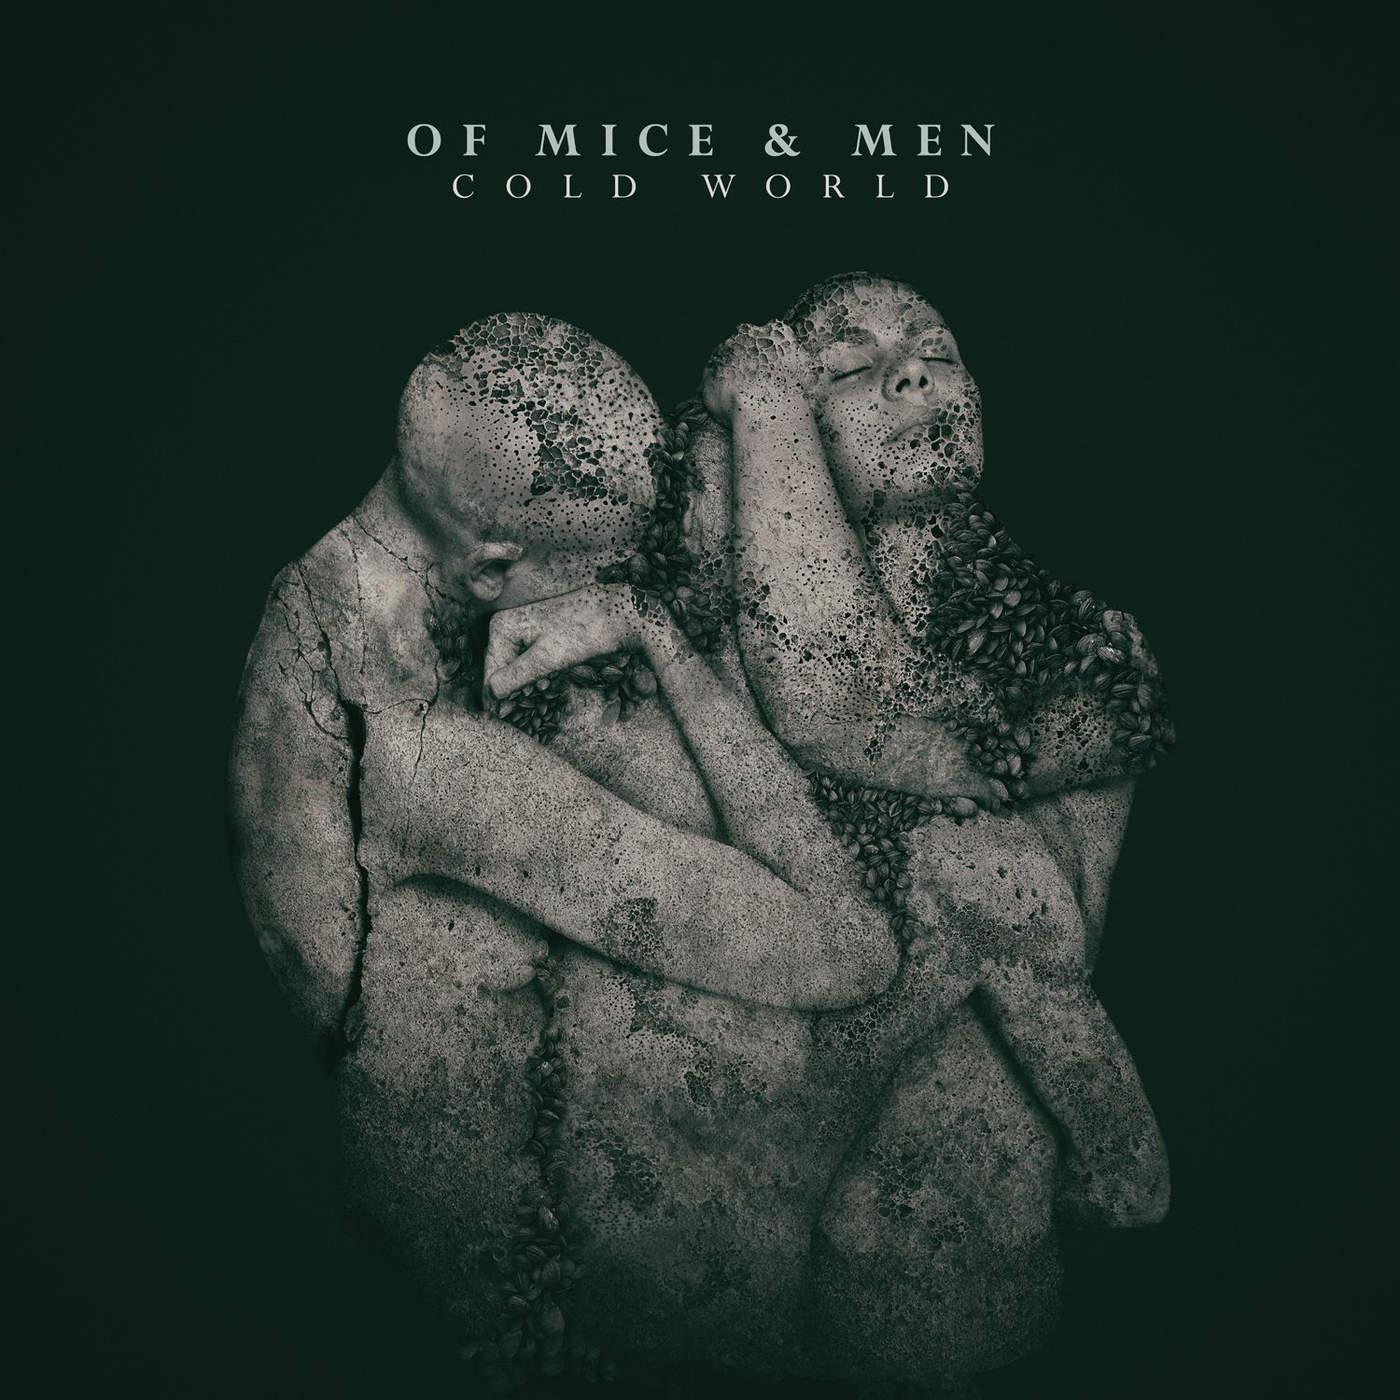 Of Mice & Men - Real [single] (2016)